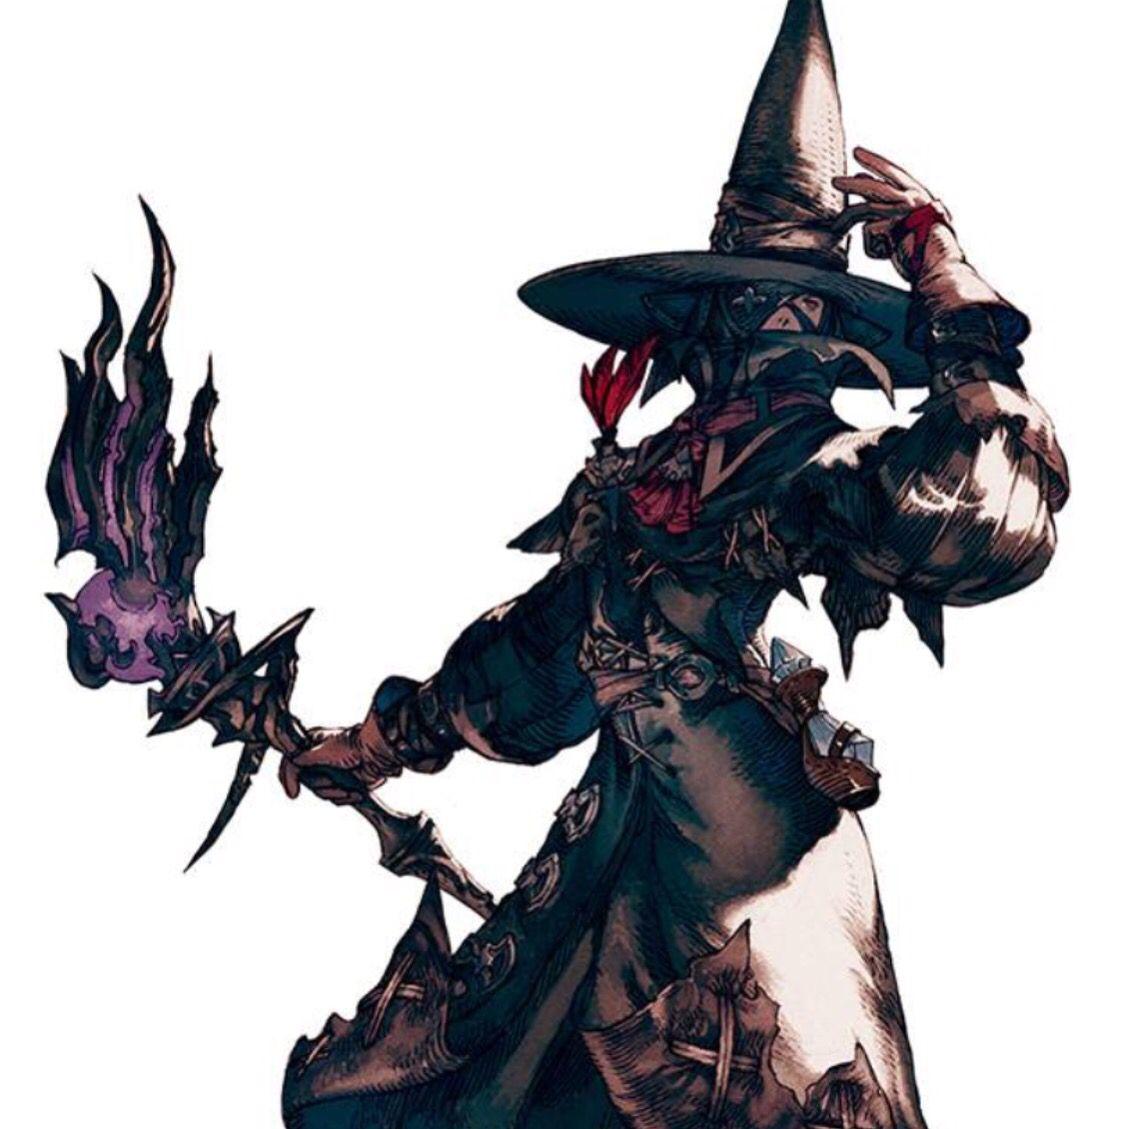 Black mage #ffxiv #finalfantasy14 | FF XIV | Diseño de personajes